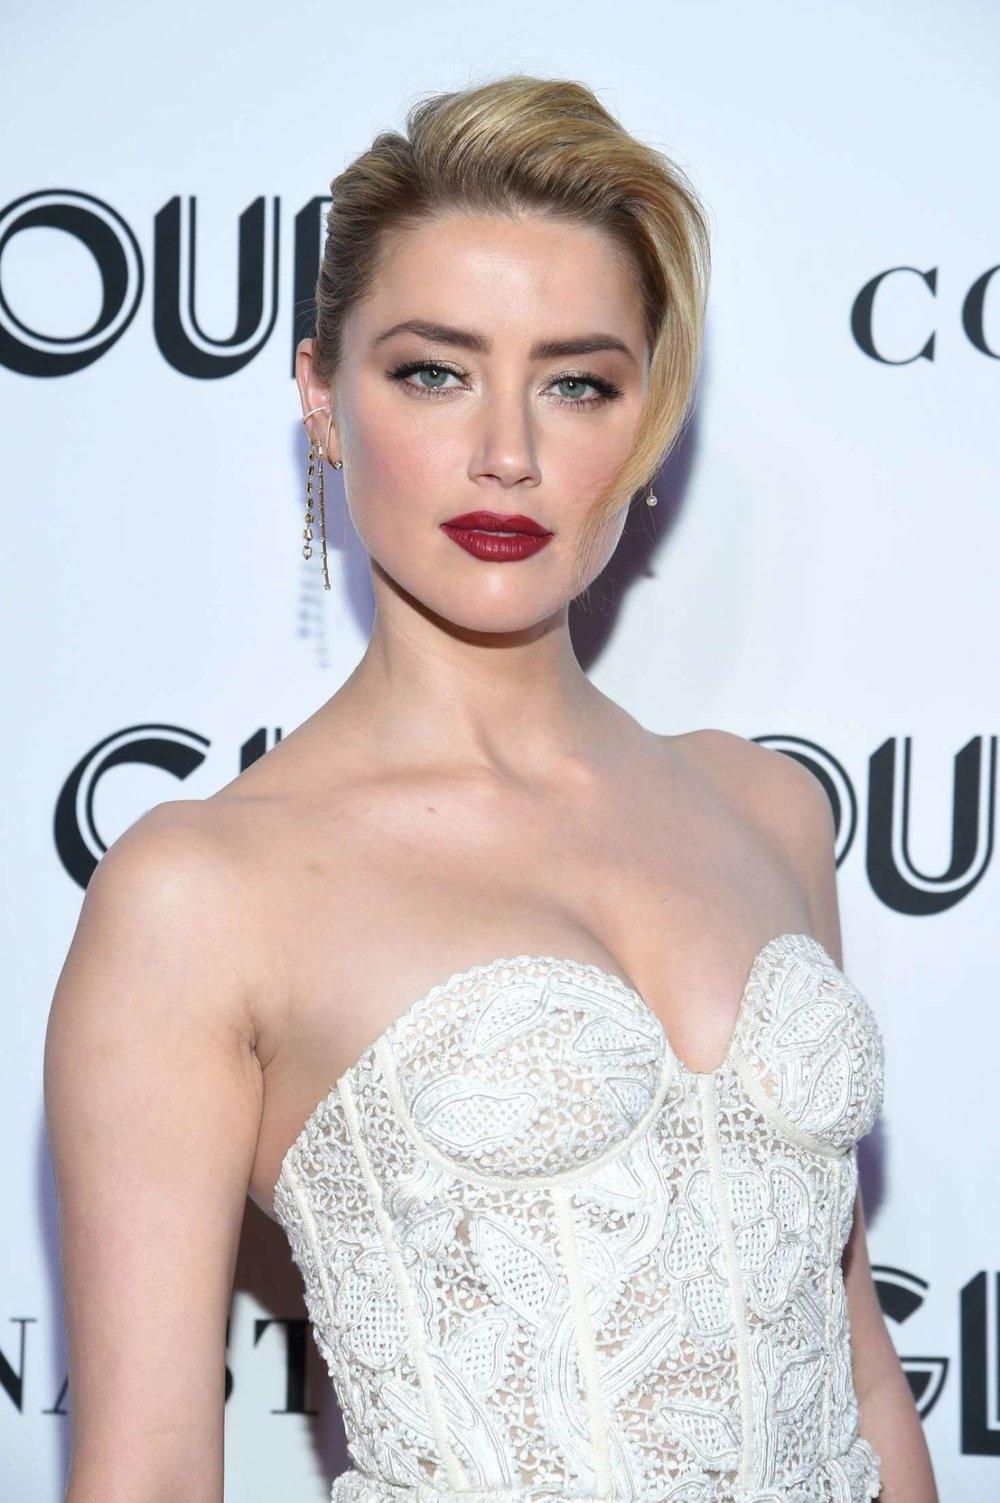 Amber-Heard_-2018-Glamour-Women-of-the-Year-Awards--22.jpg